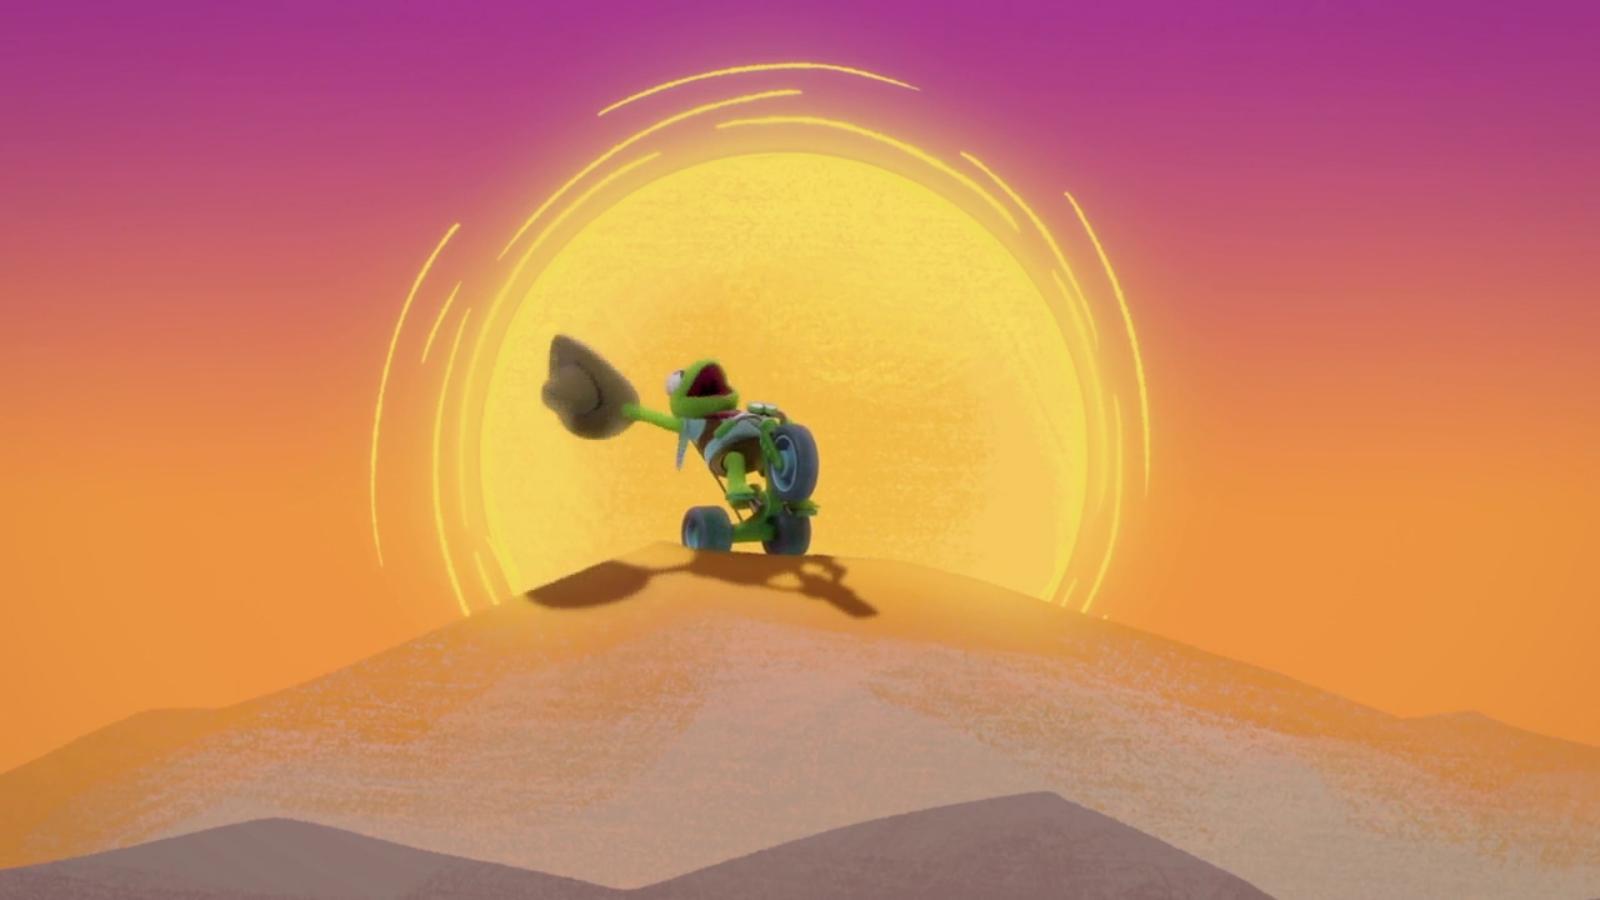 Hopalong Froggy and the Buckin' Bronco